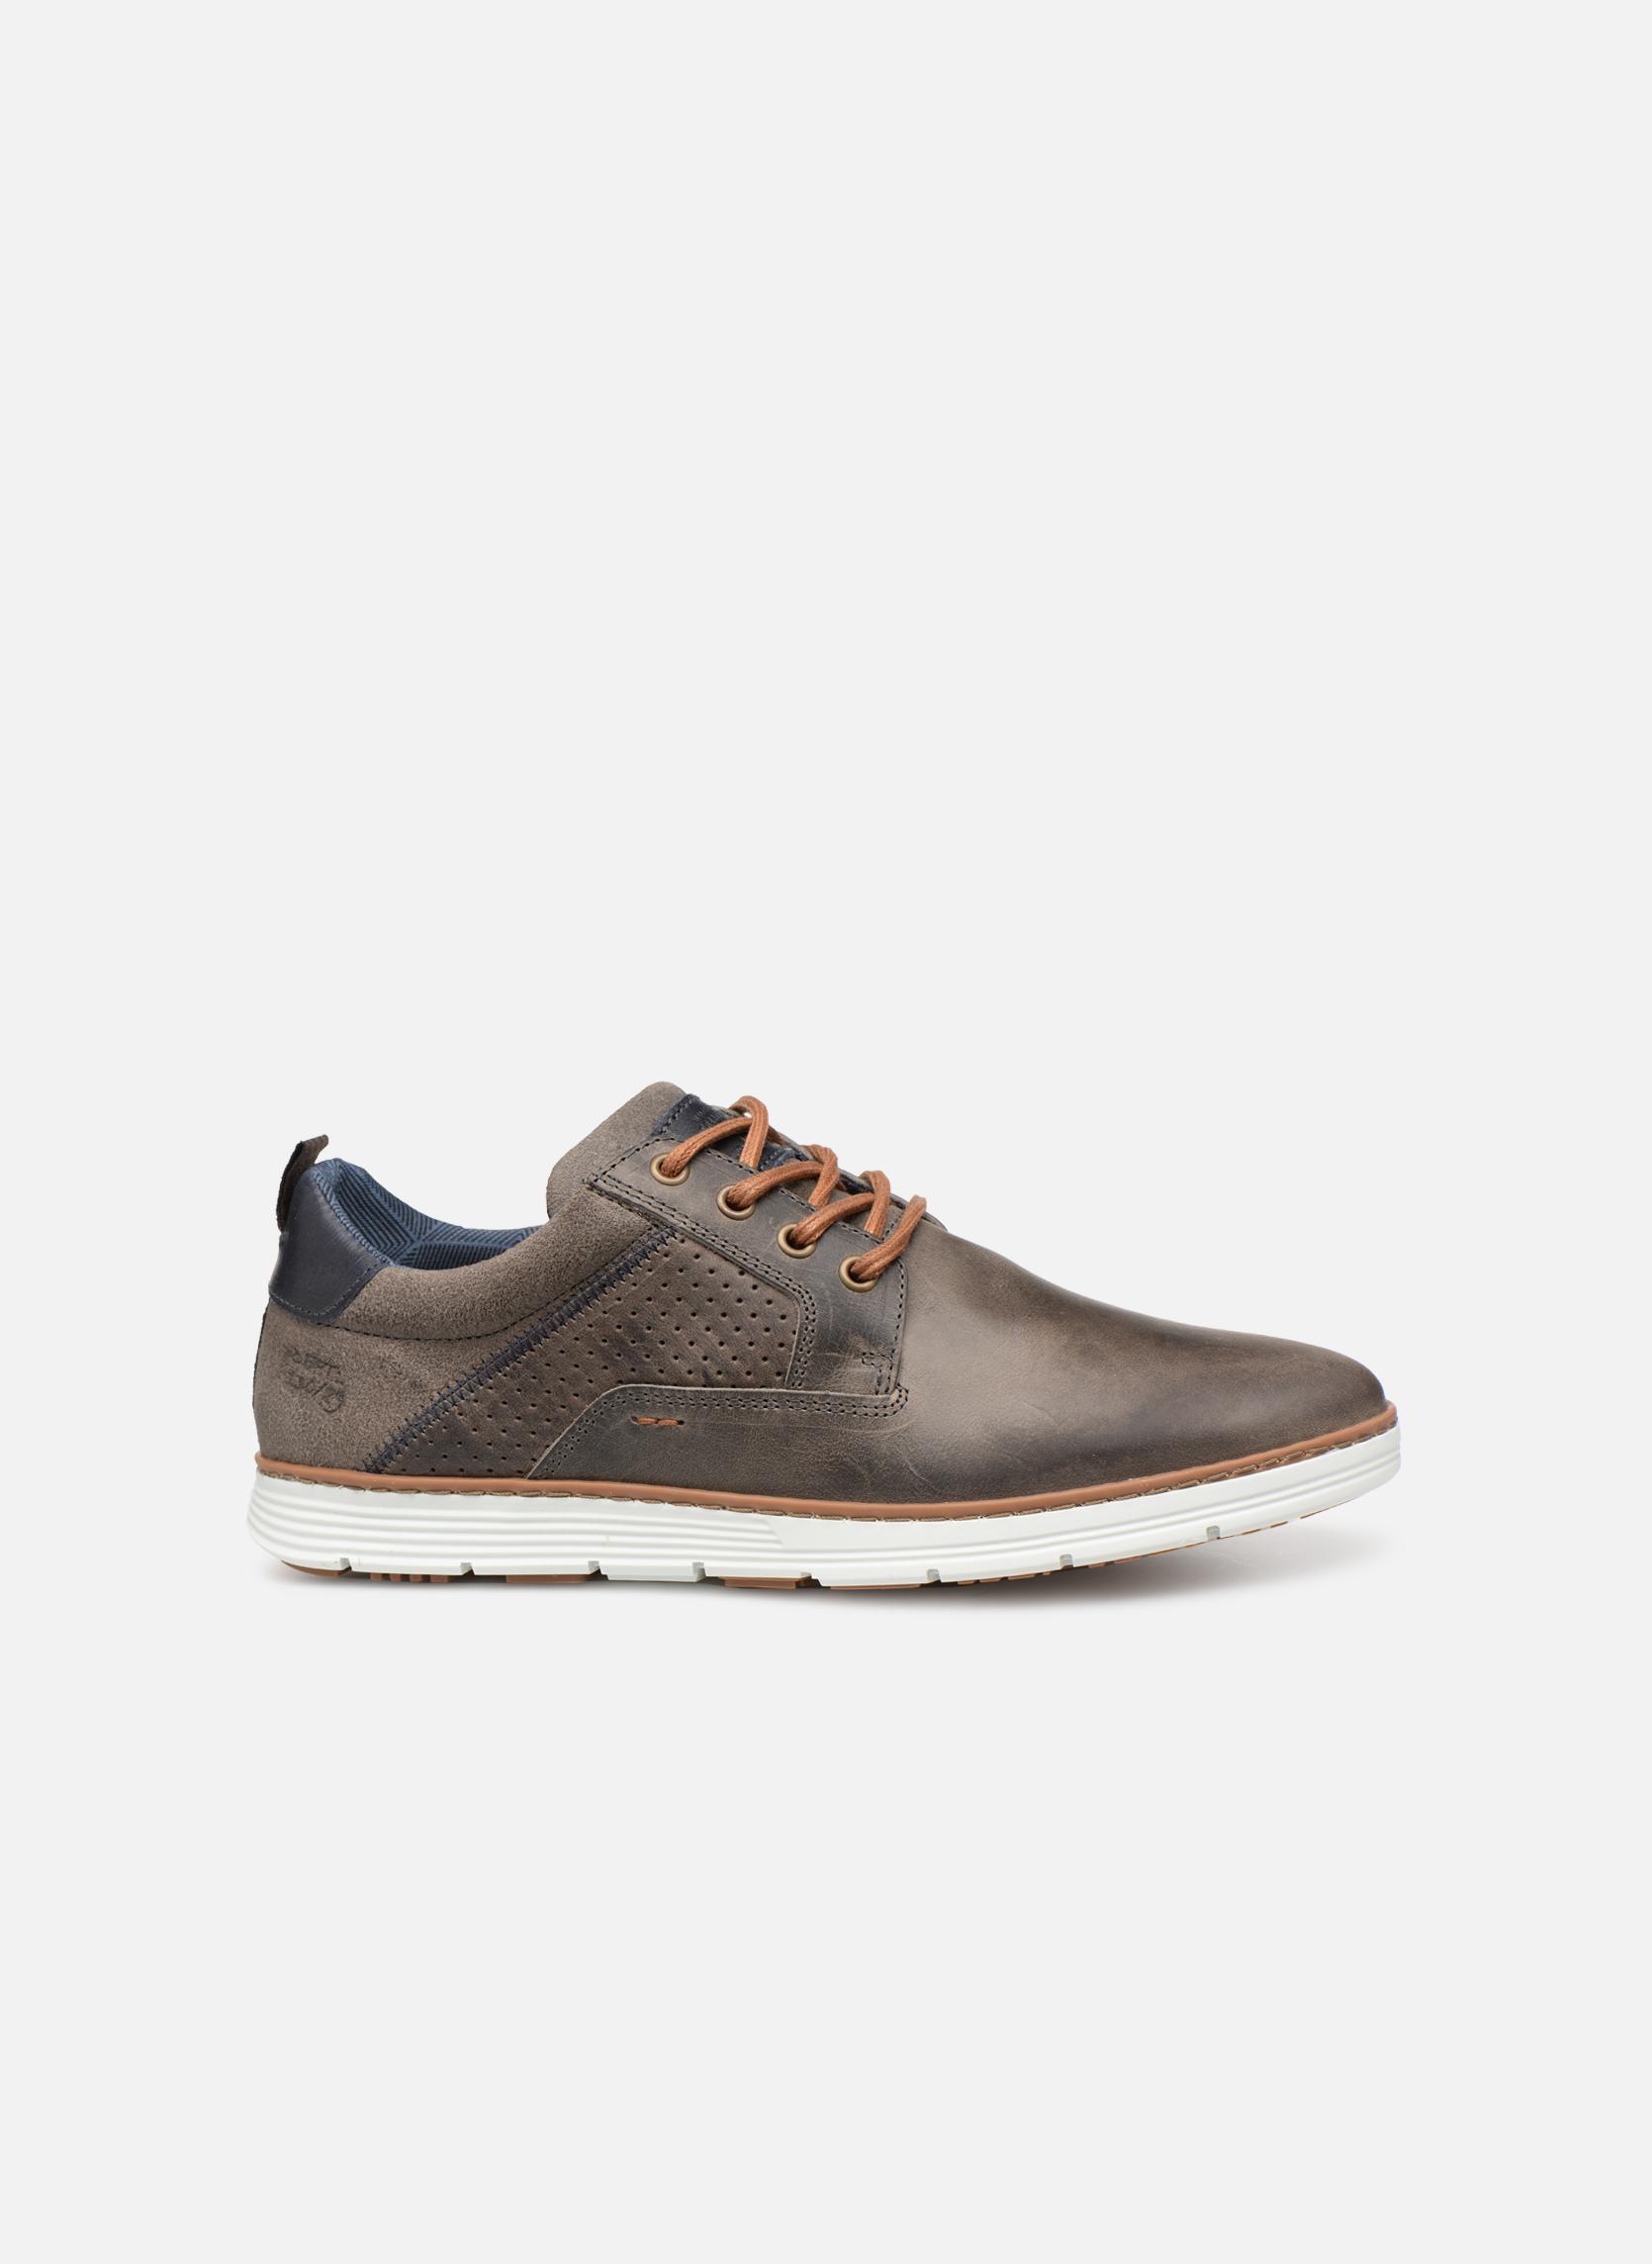 366a317ee210 Chaussures homme - Chaussure homme sur Internet - Sarenza